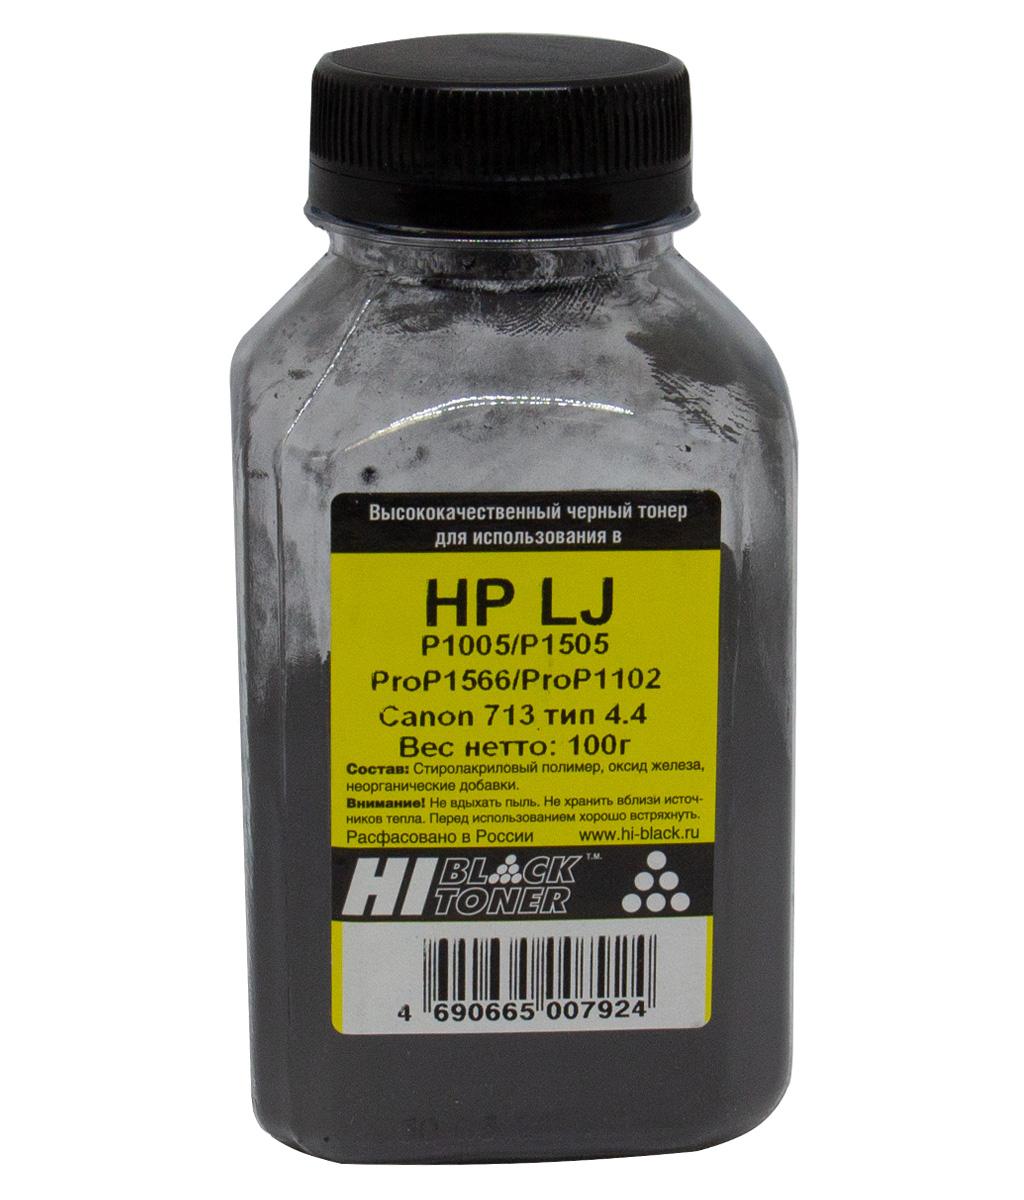 Тонер Hi-Black для HP LJ P1005/P1505/ProP1566/ProP1102/Canon713, Тип 4.4, Bk, 100 г, банка